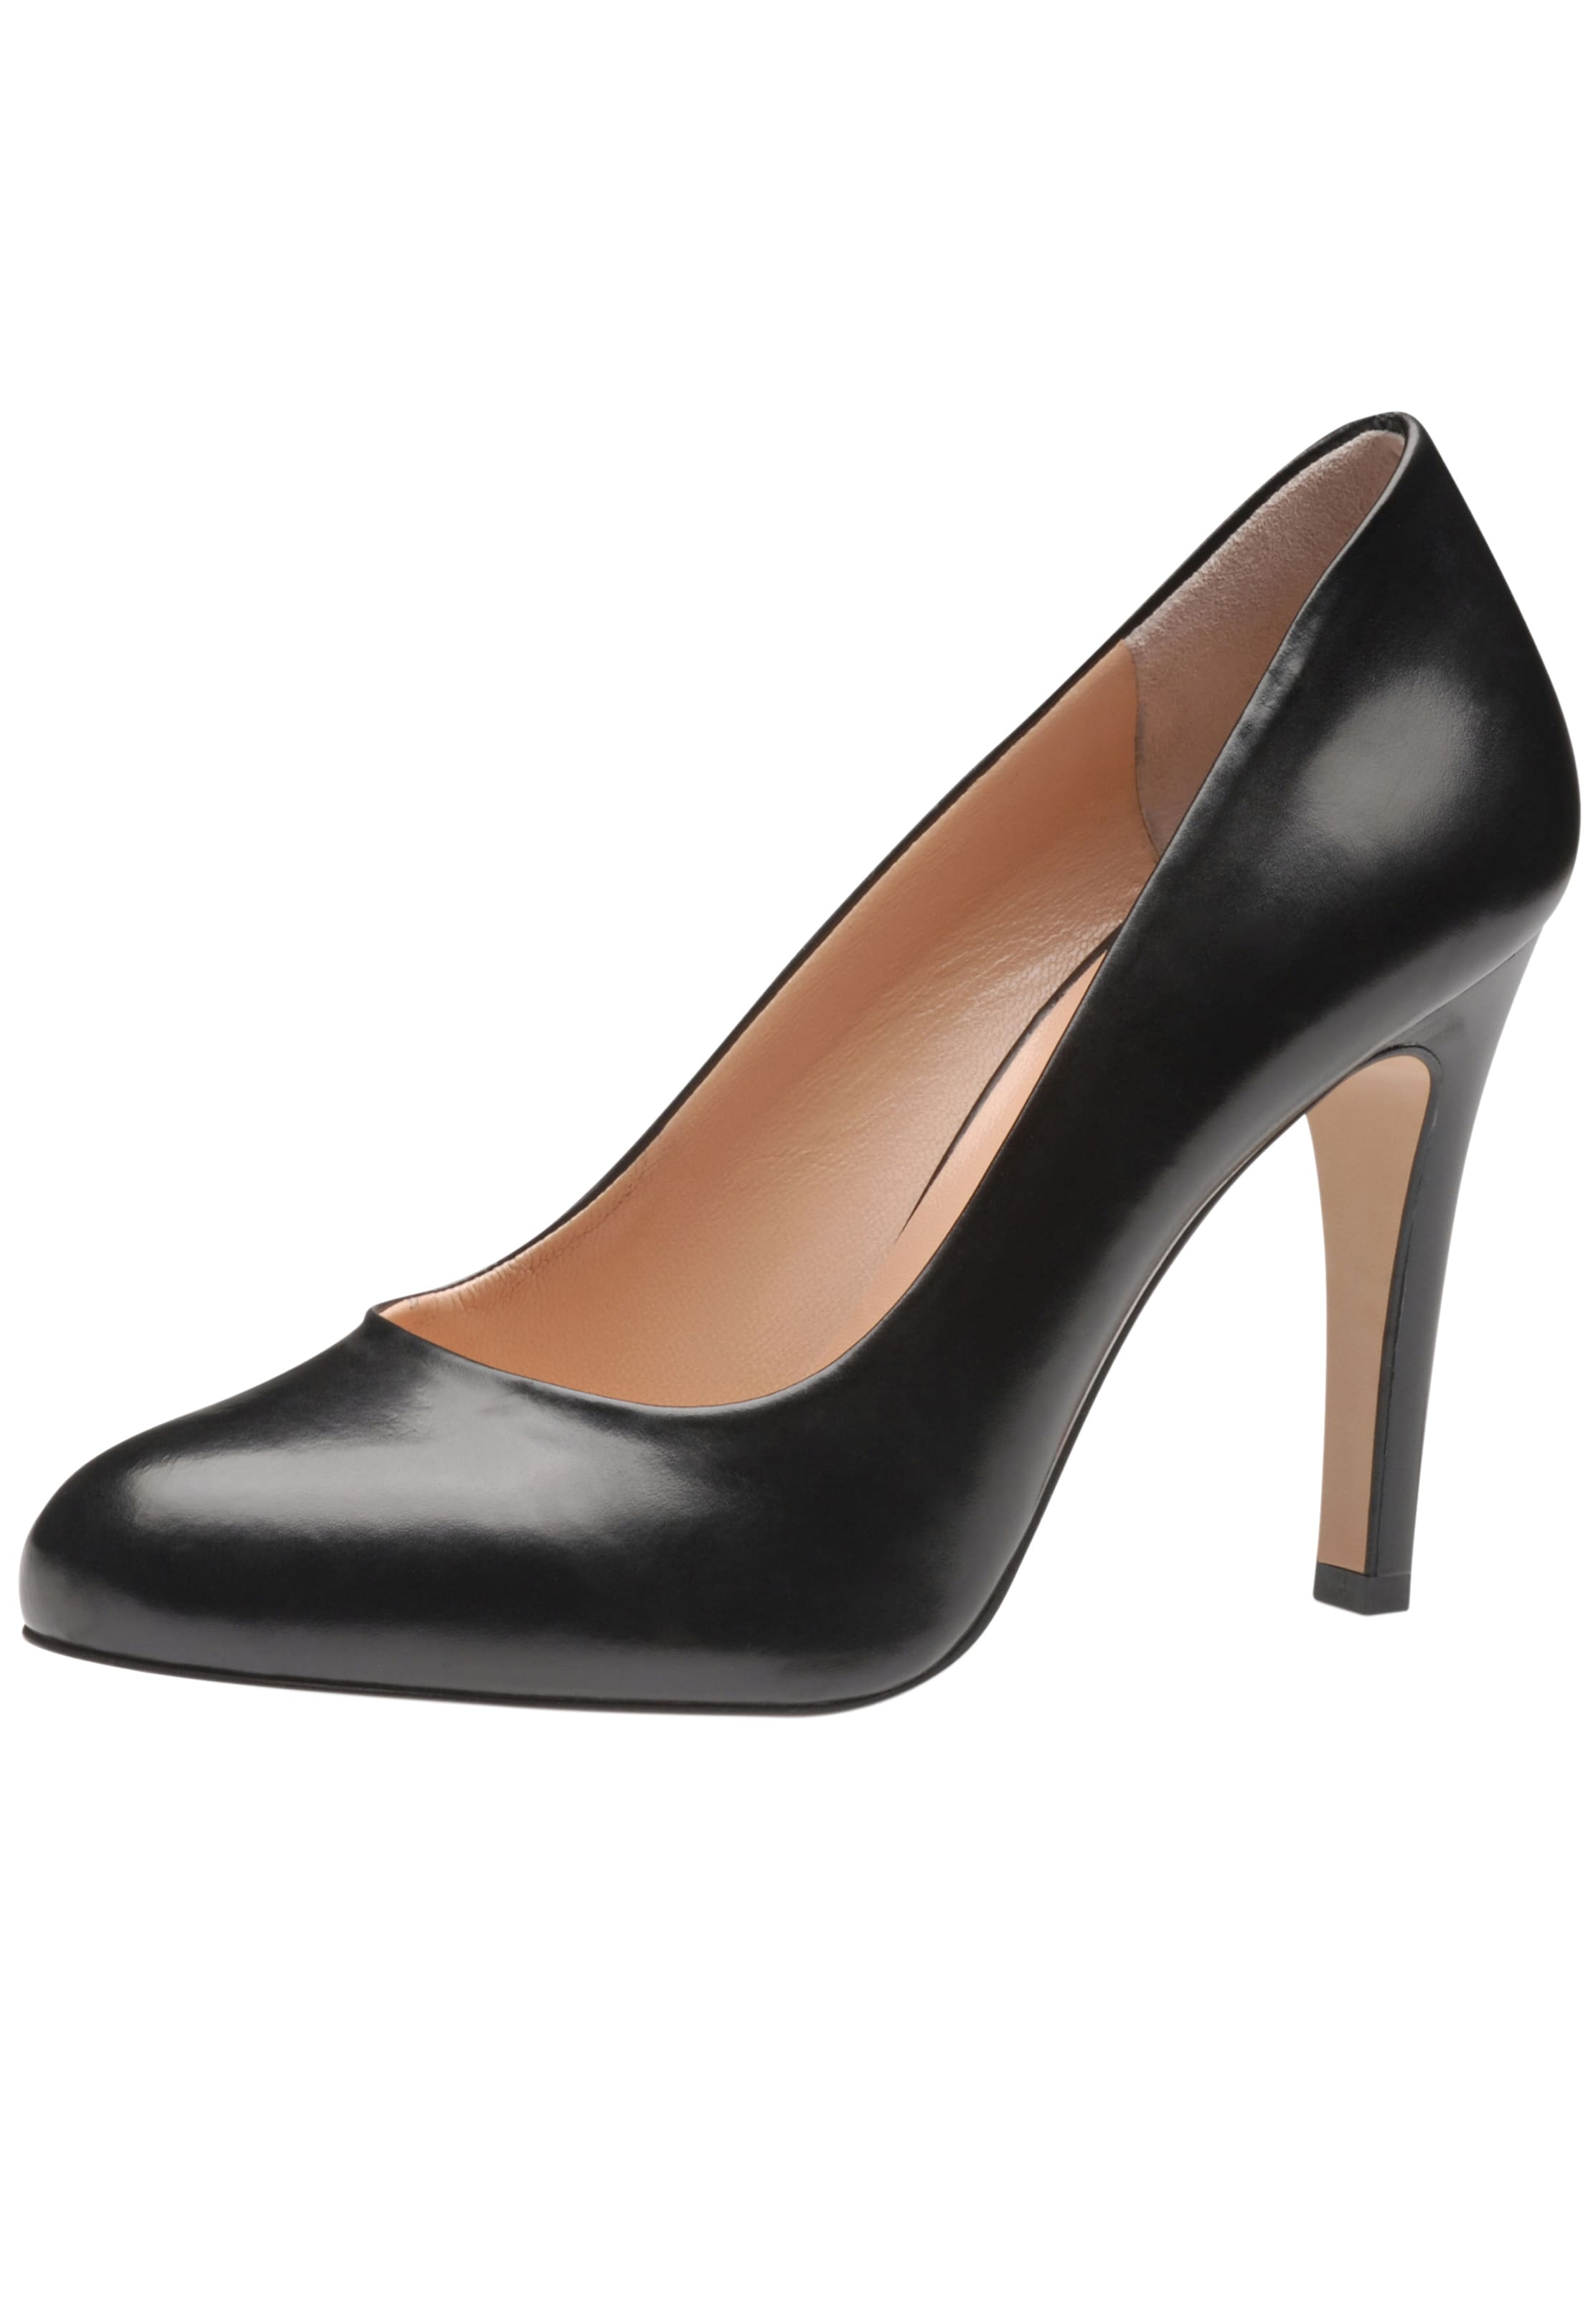 Escarpins Noir Evita Noir En Escarpins Evita En 8w0nmNv